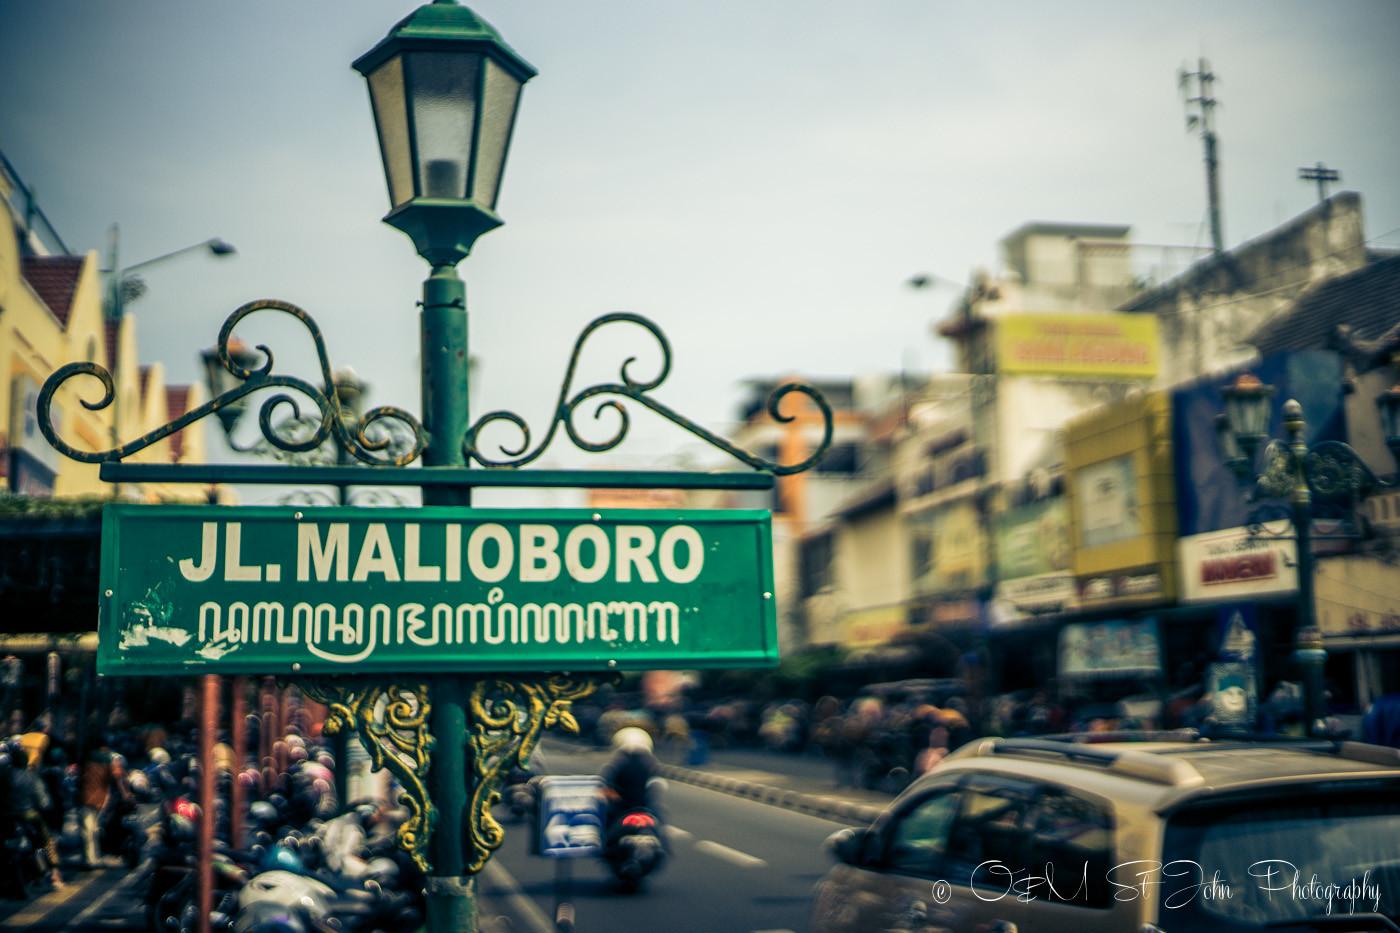 places to visit in yogyakarta: Jalan Malioboro, popular shopping promenade